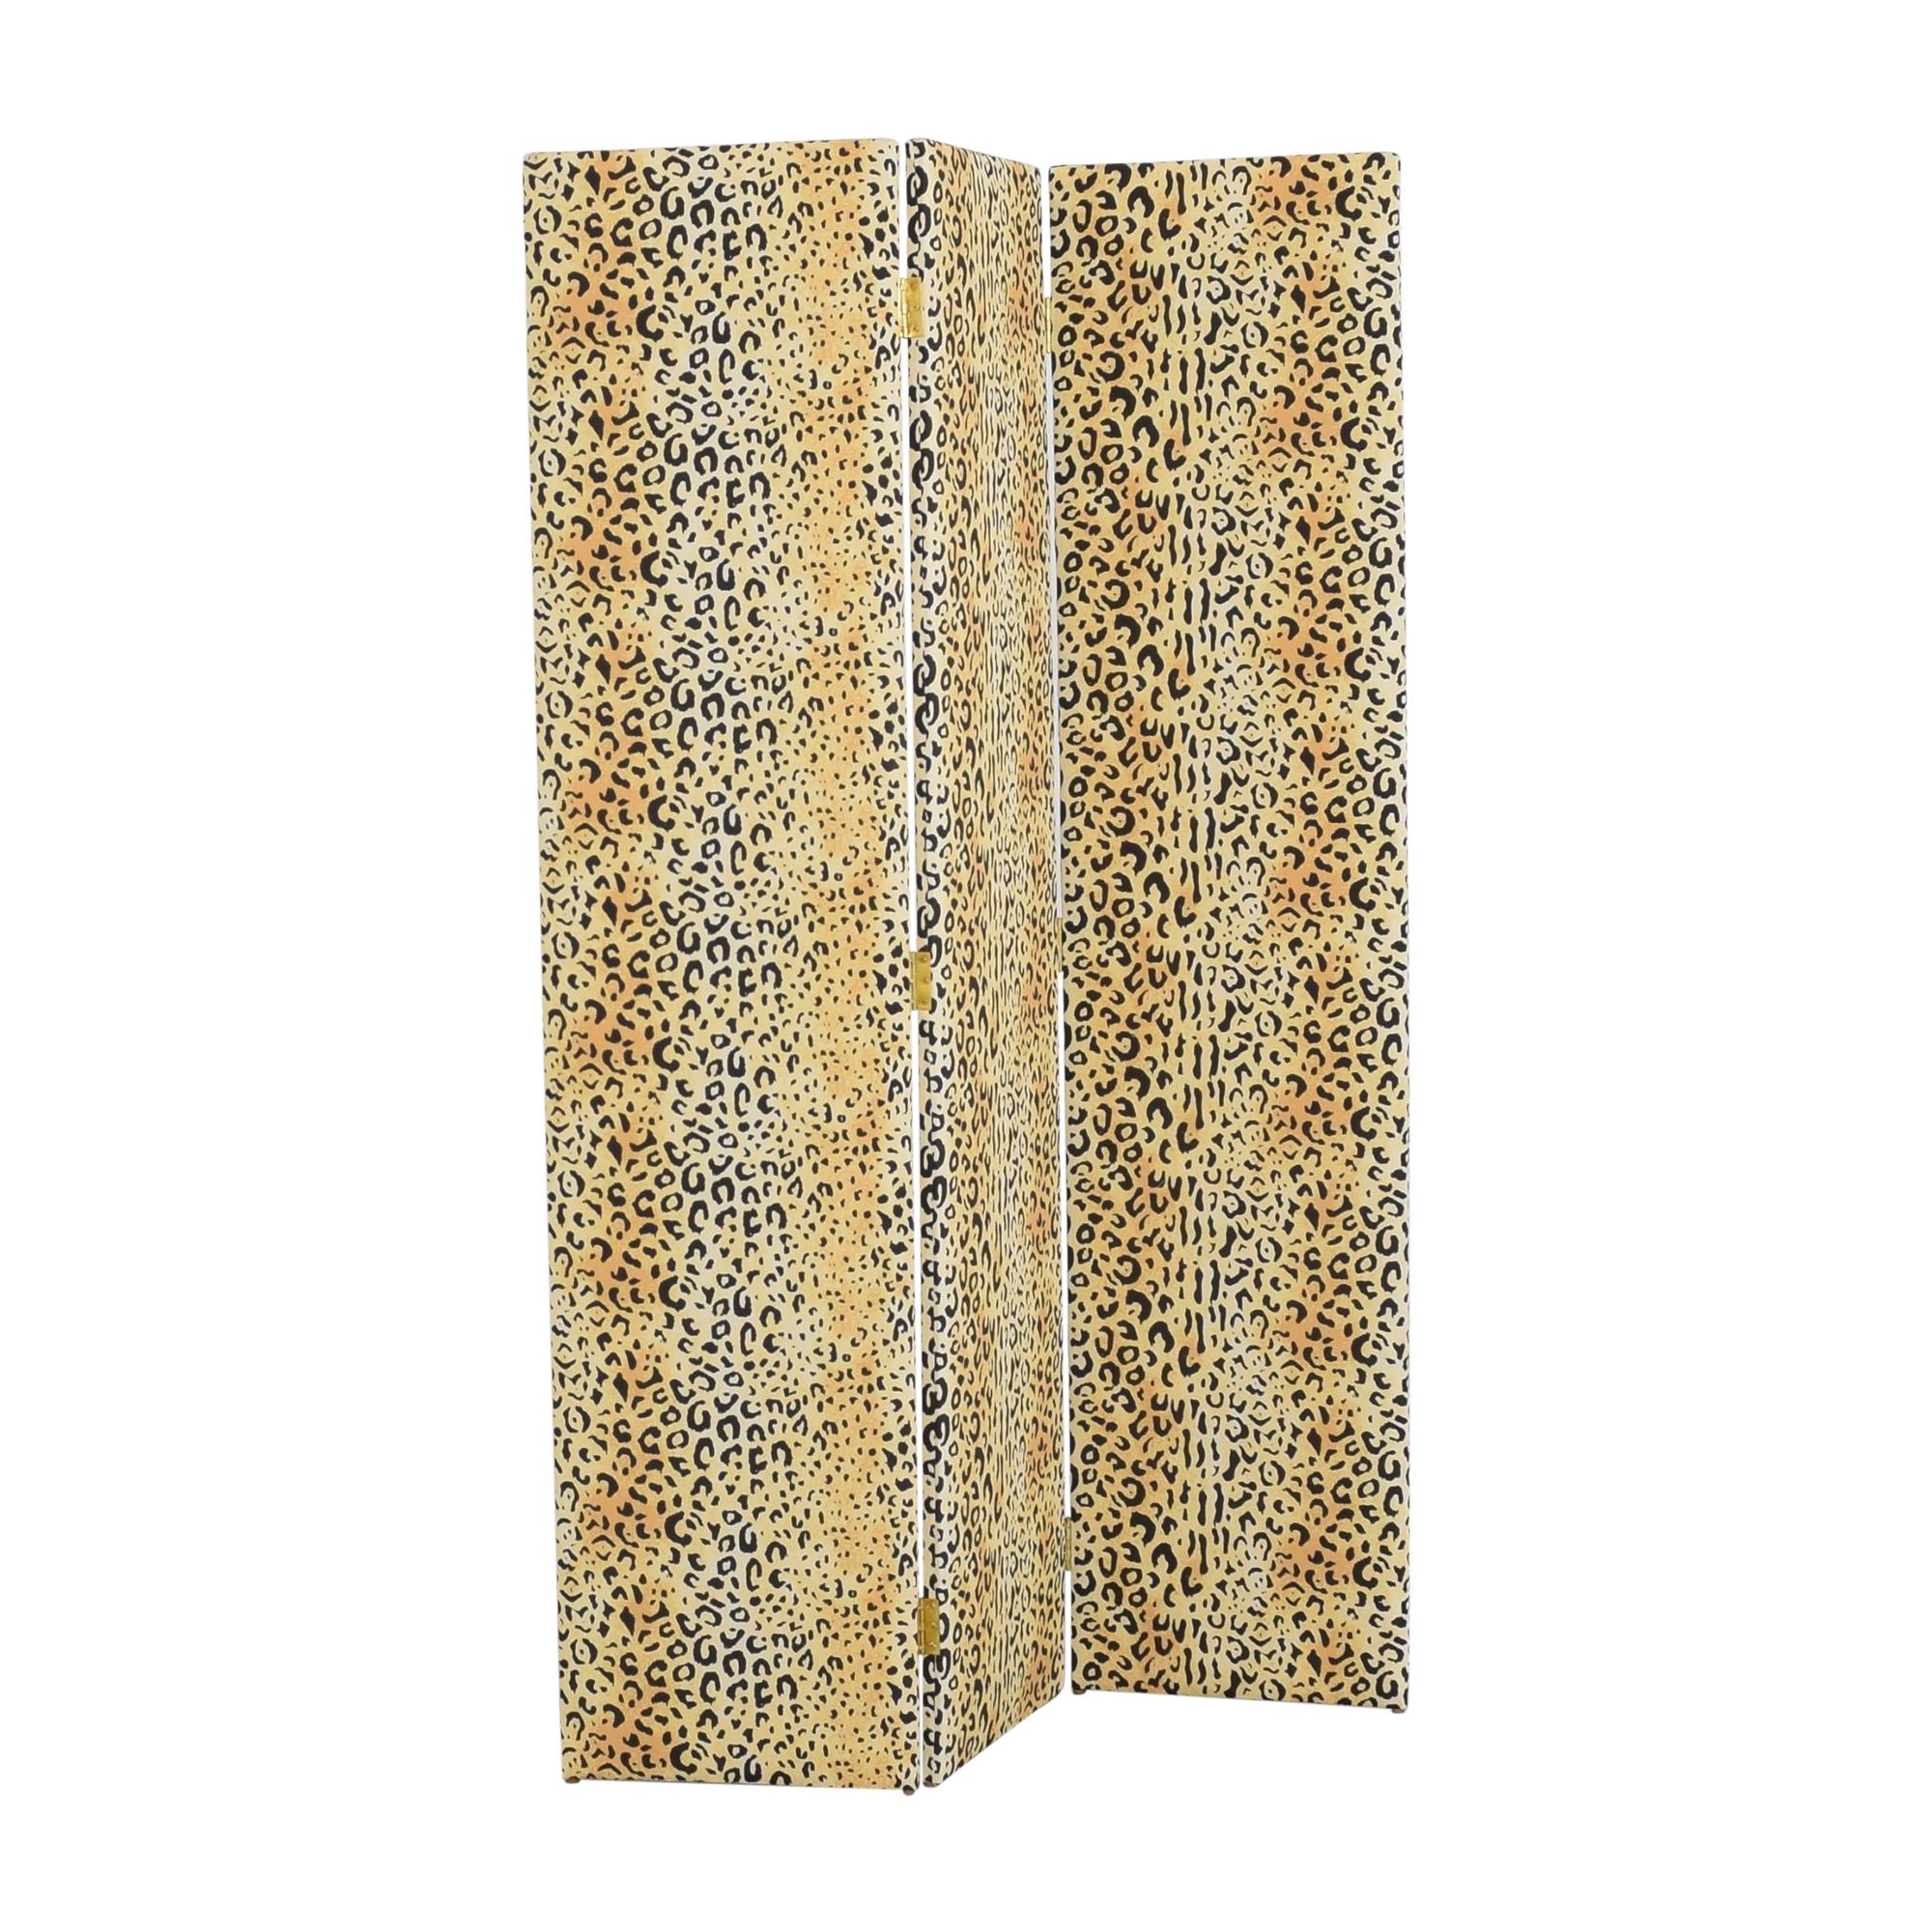 buy The Inside Leopard Modern Screen The Inside Dividers